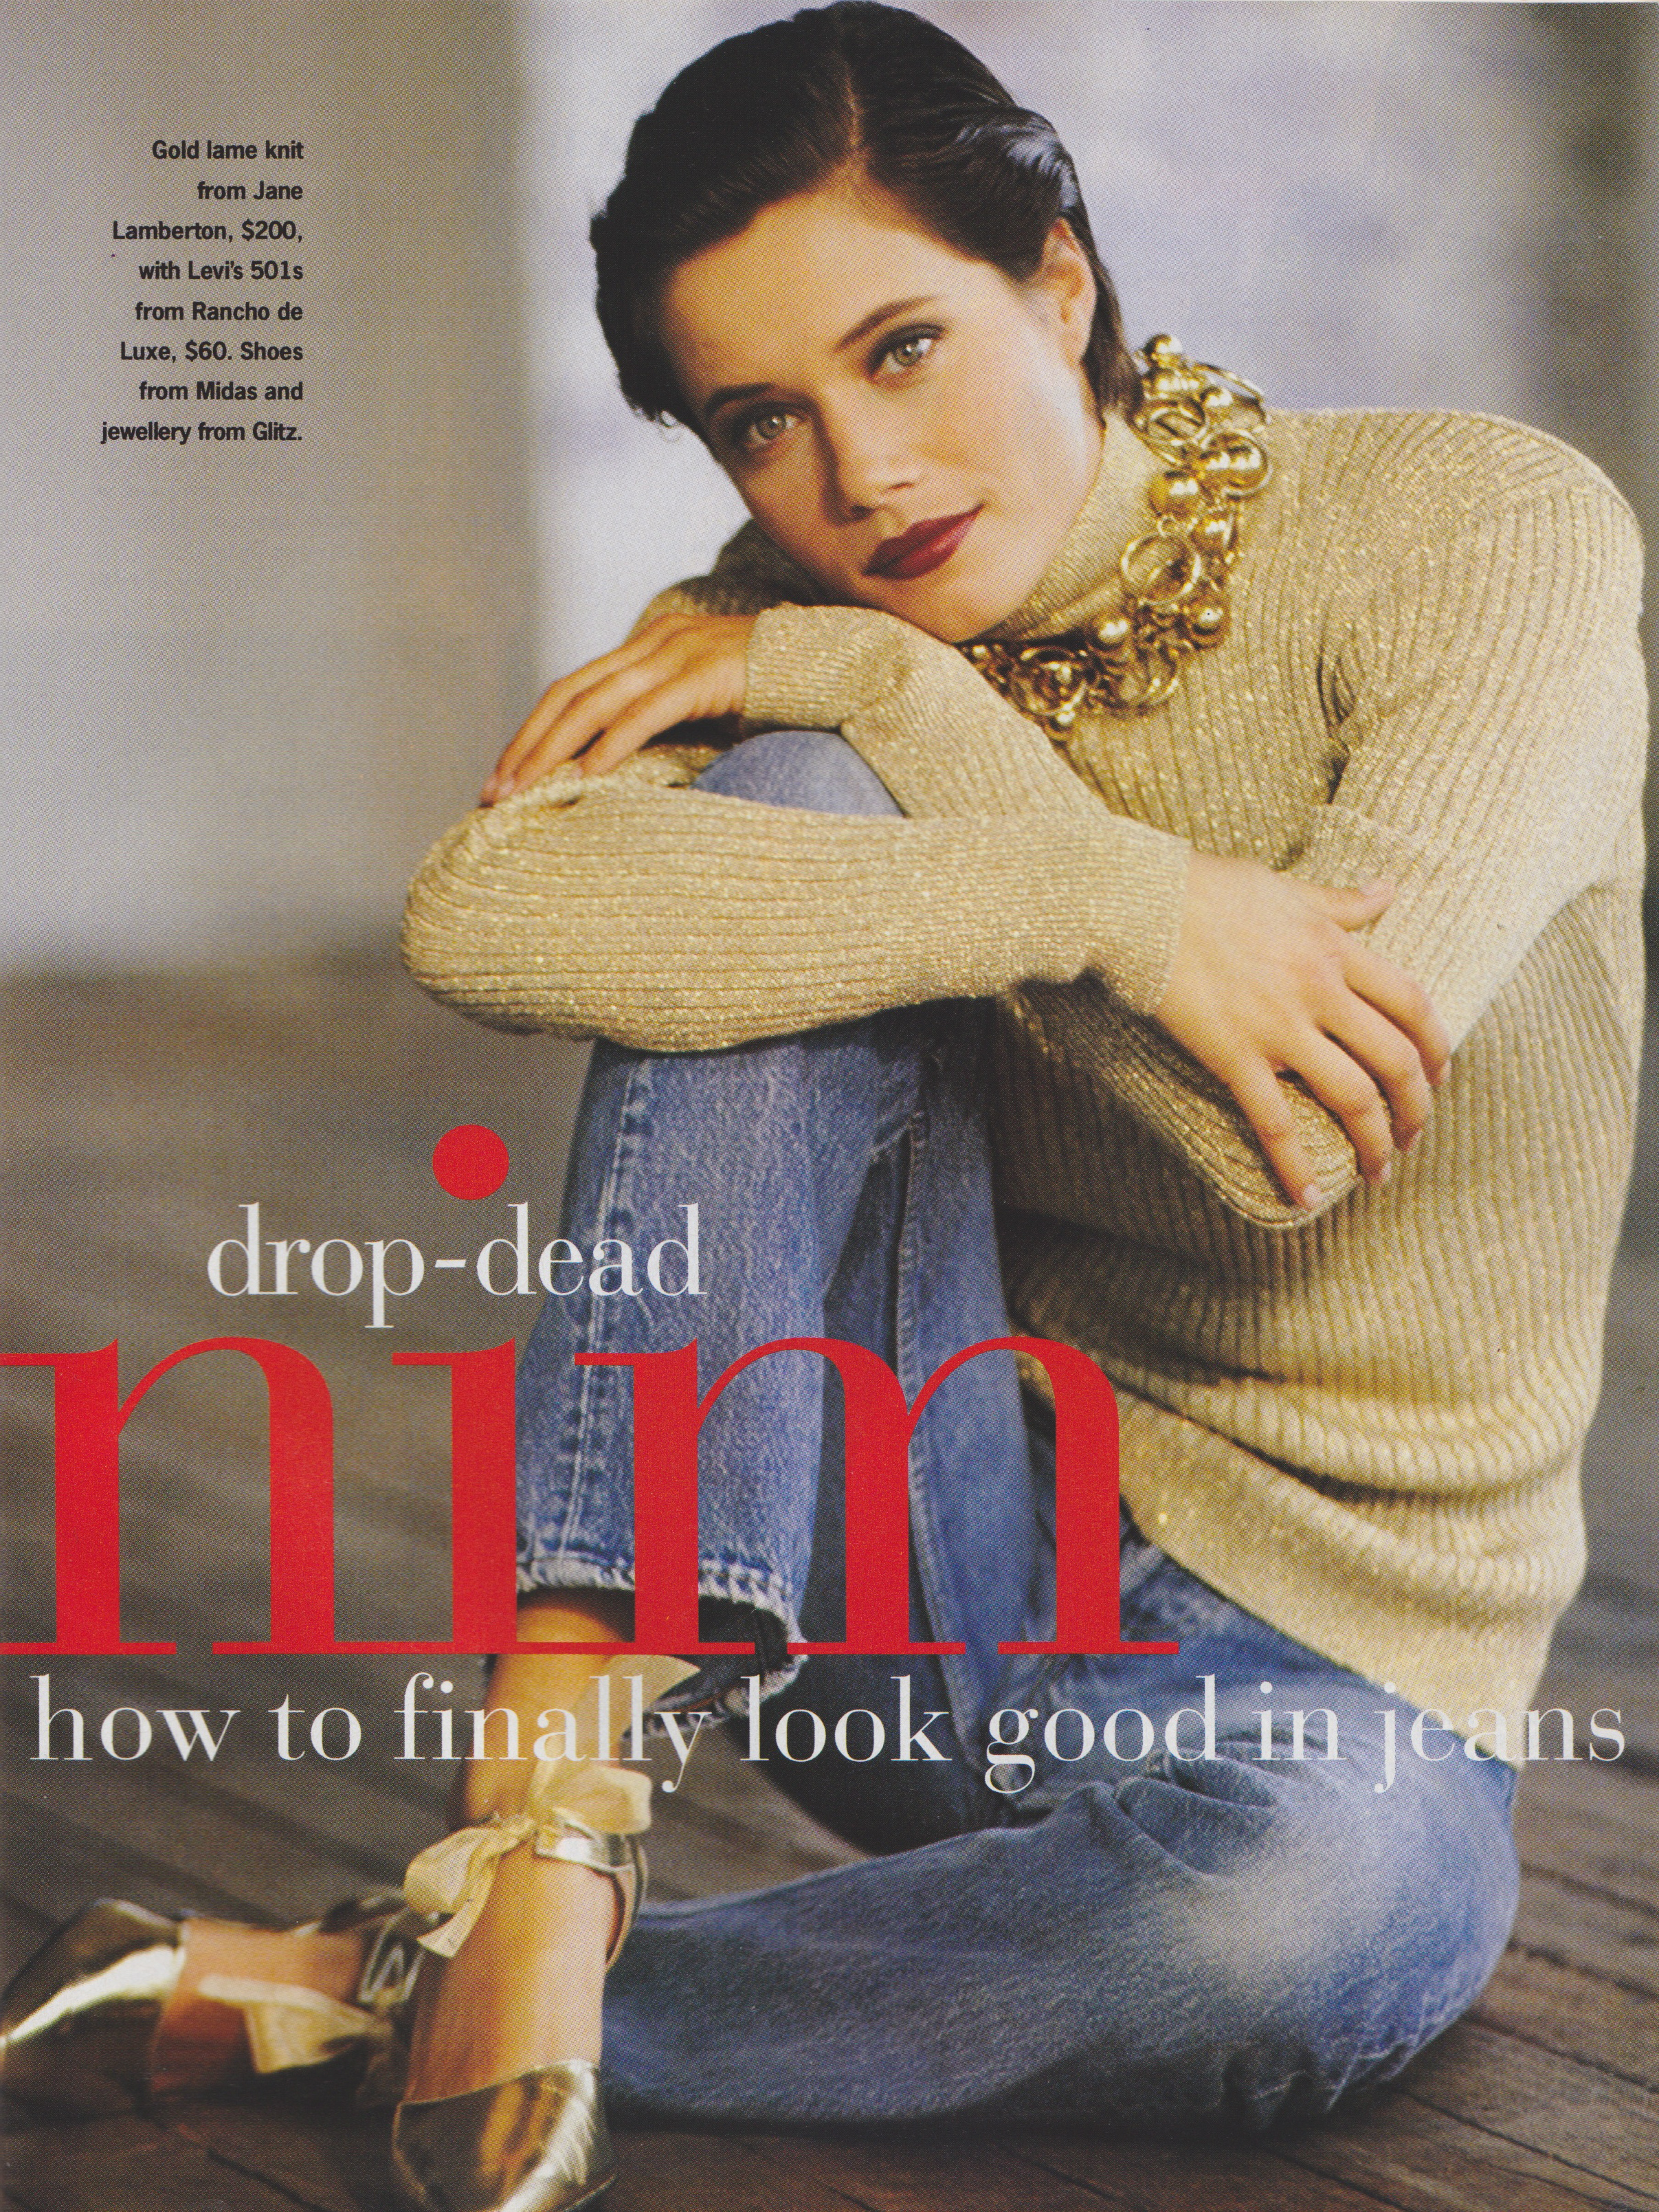 Cleo July 1992 | Denim (Anna Louise Gould) 02.jpeg